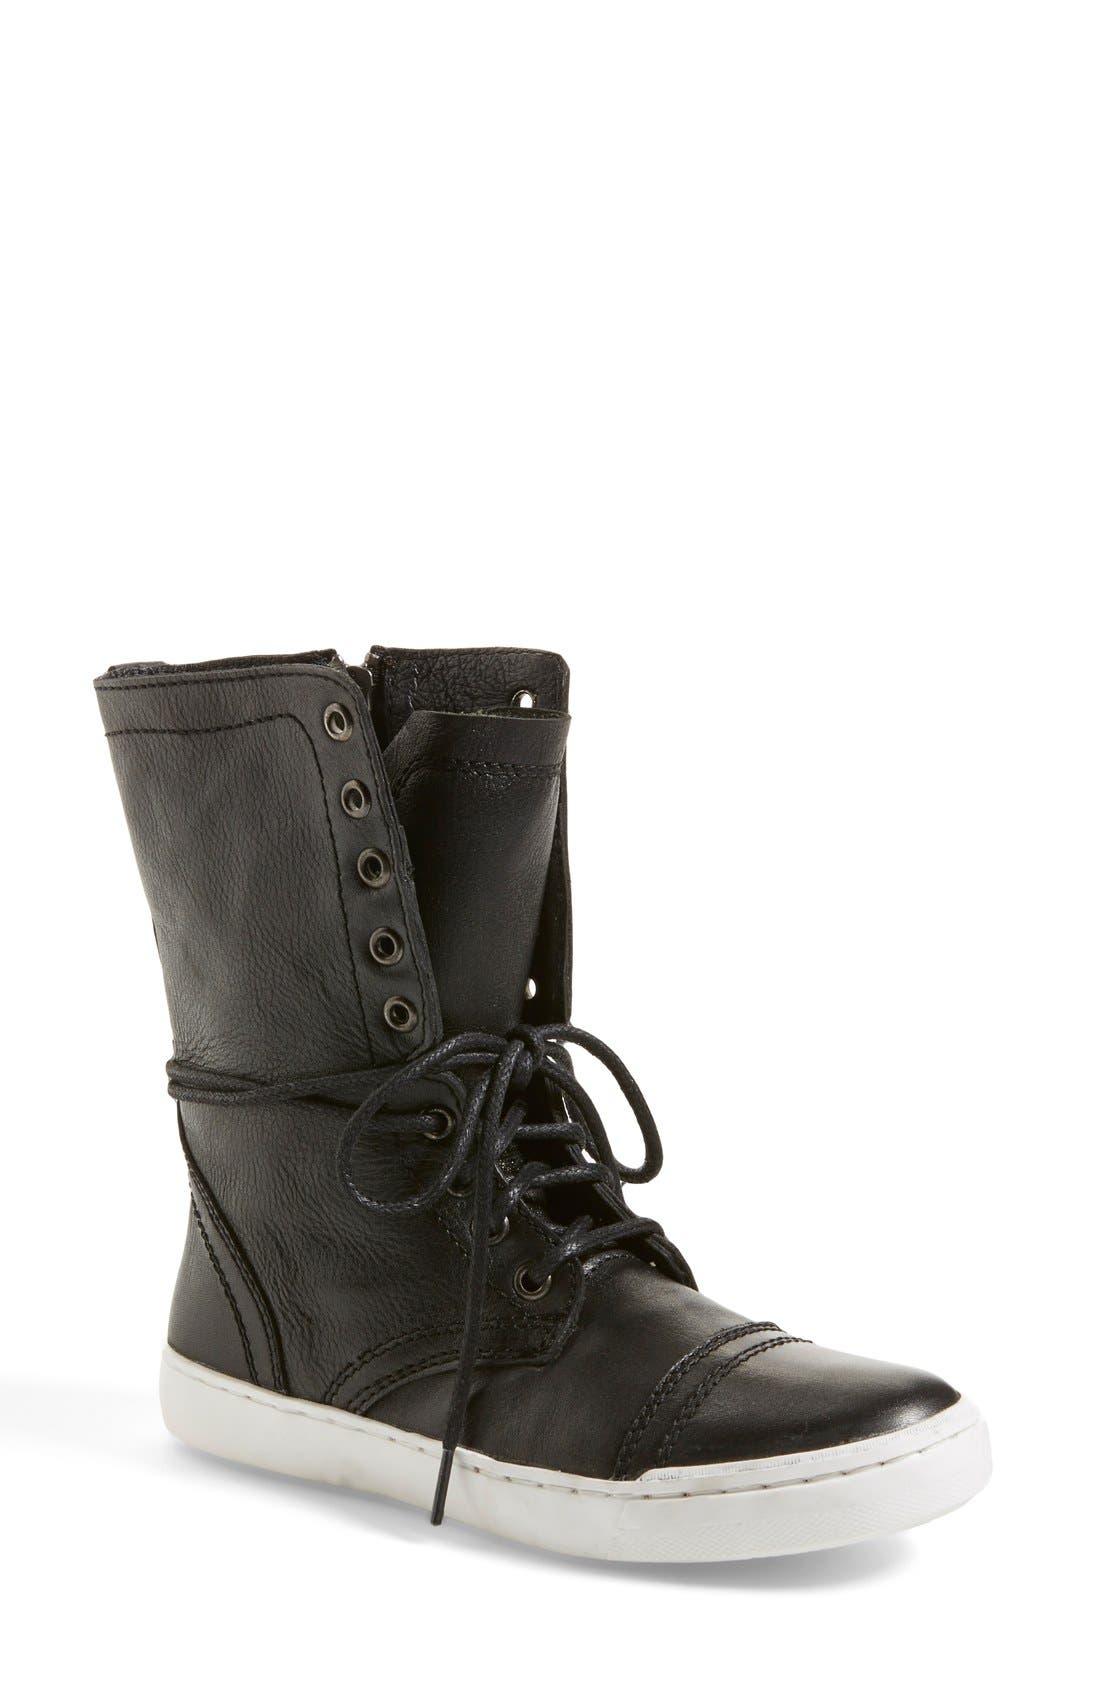 'Resolvve' Sneaker Boot,                         Main,                         color, 001